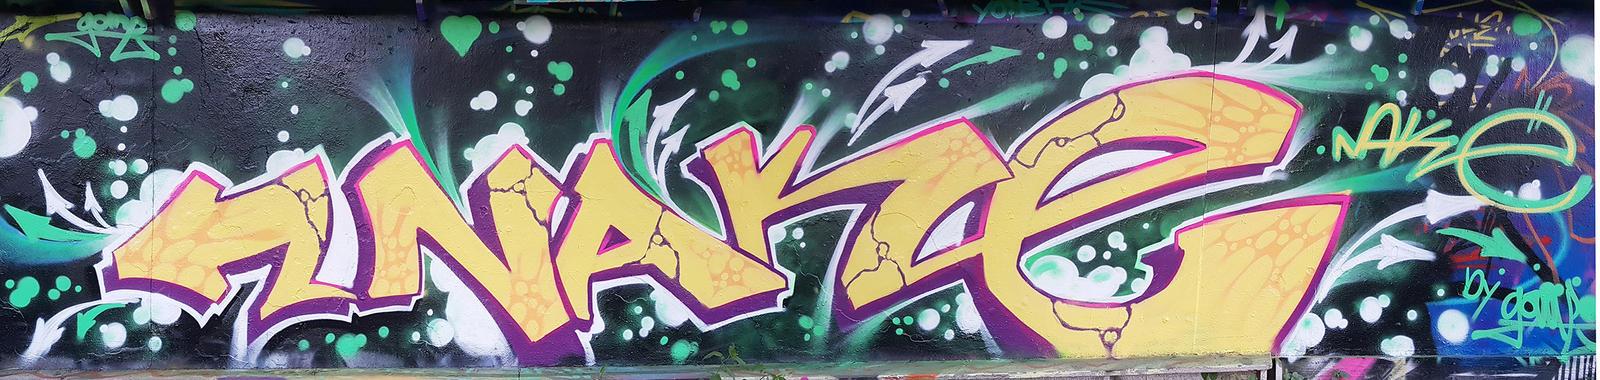 NAKE by gome by IHEA